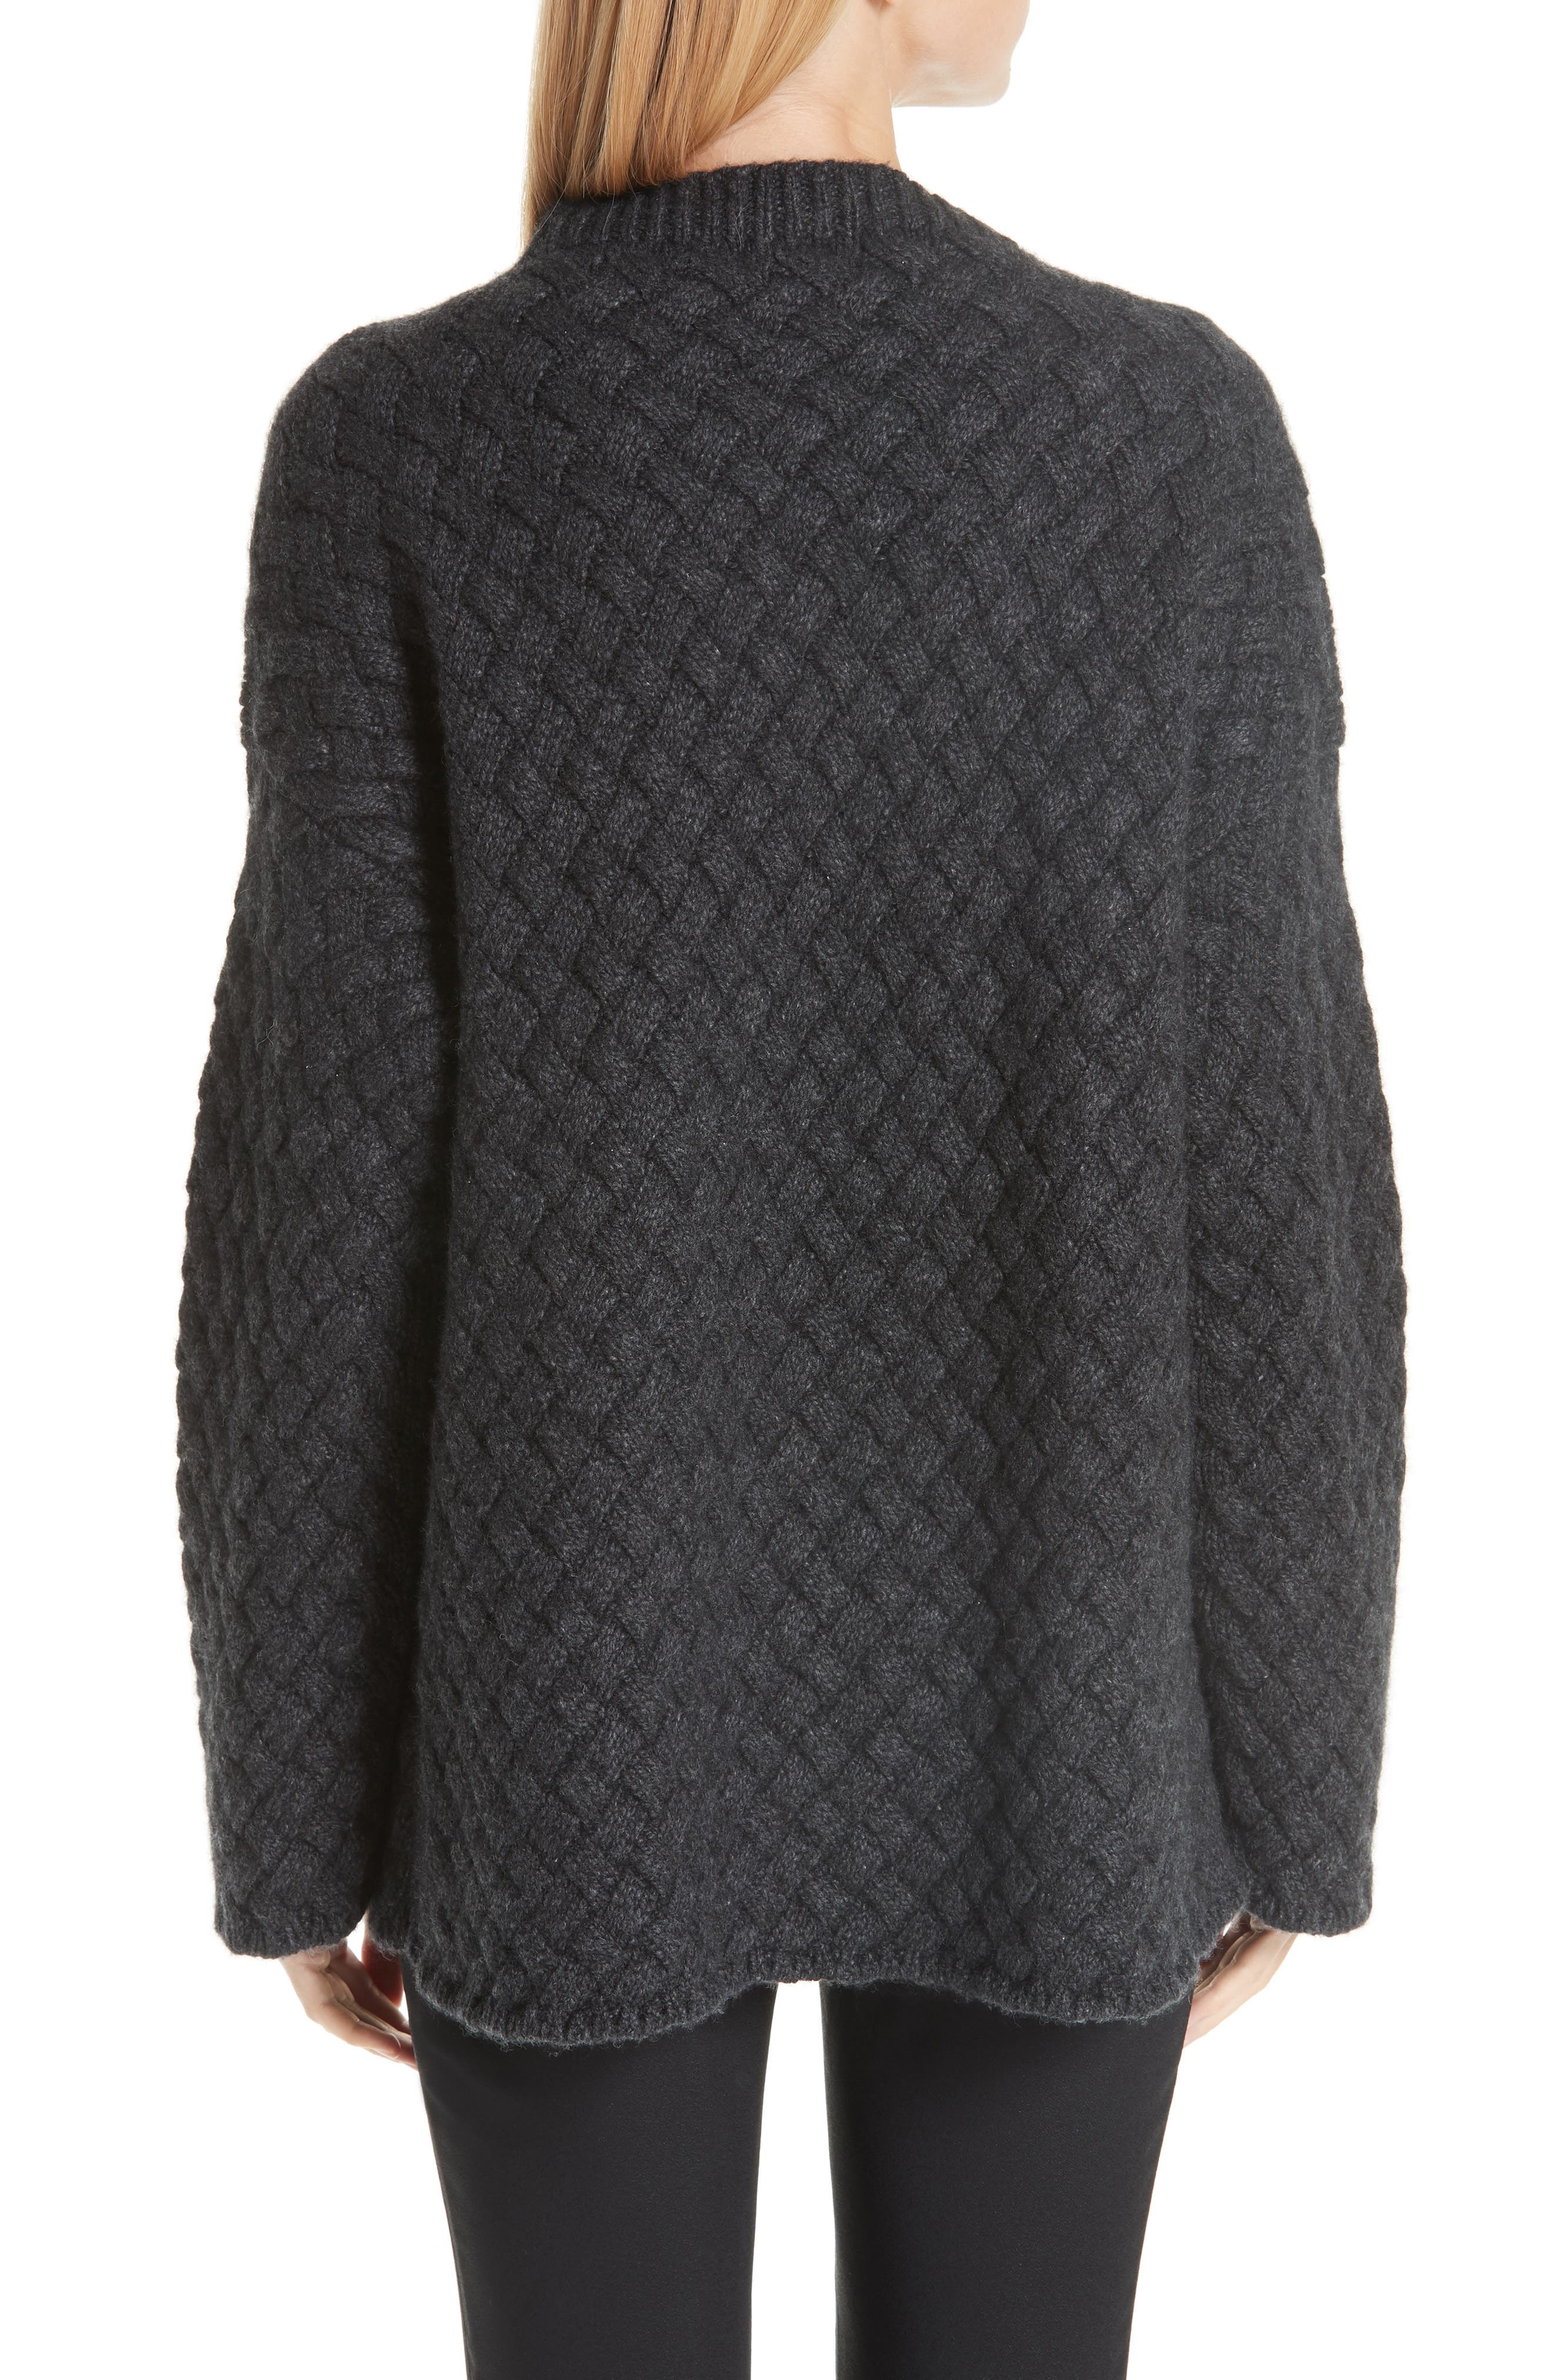 Oversized Braided Cashmere Sweater,                             Alternate thumbnail 2, color,                             DARK GREY